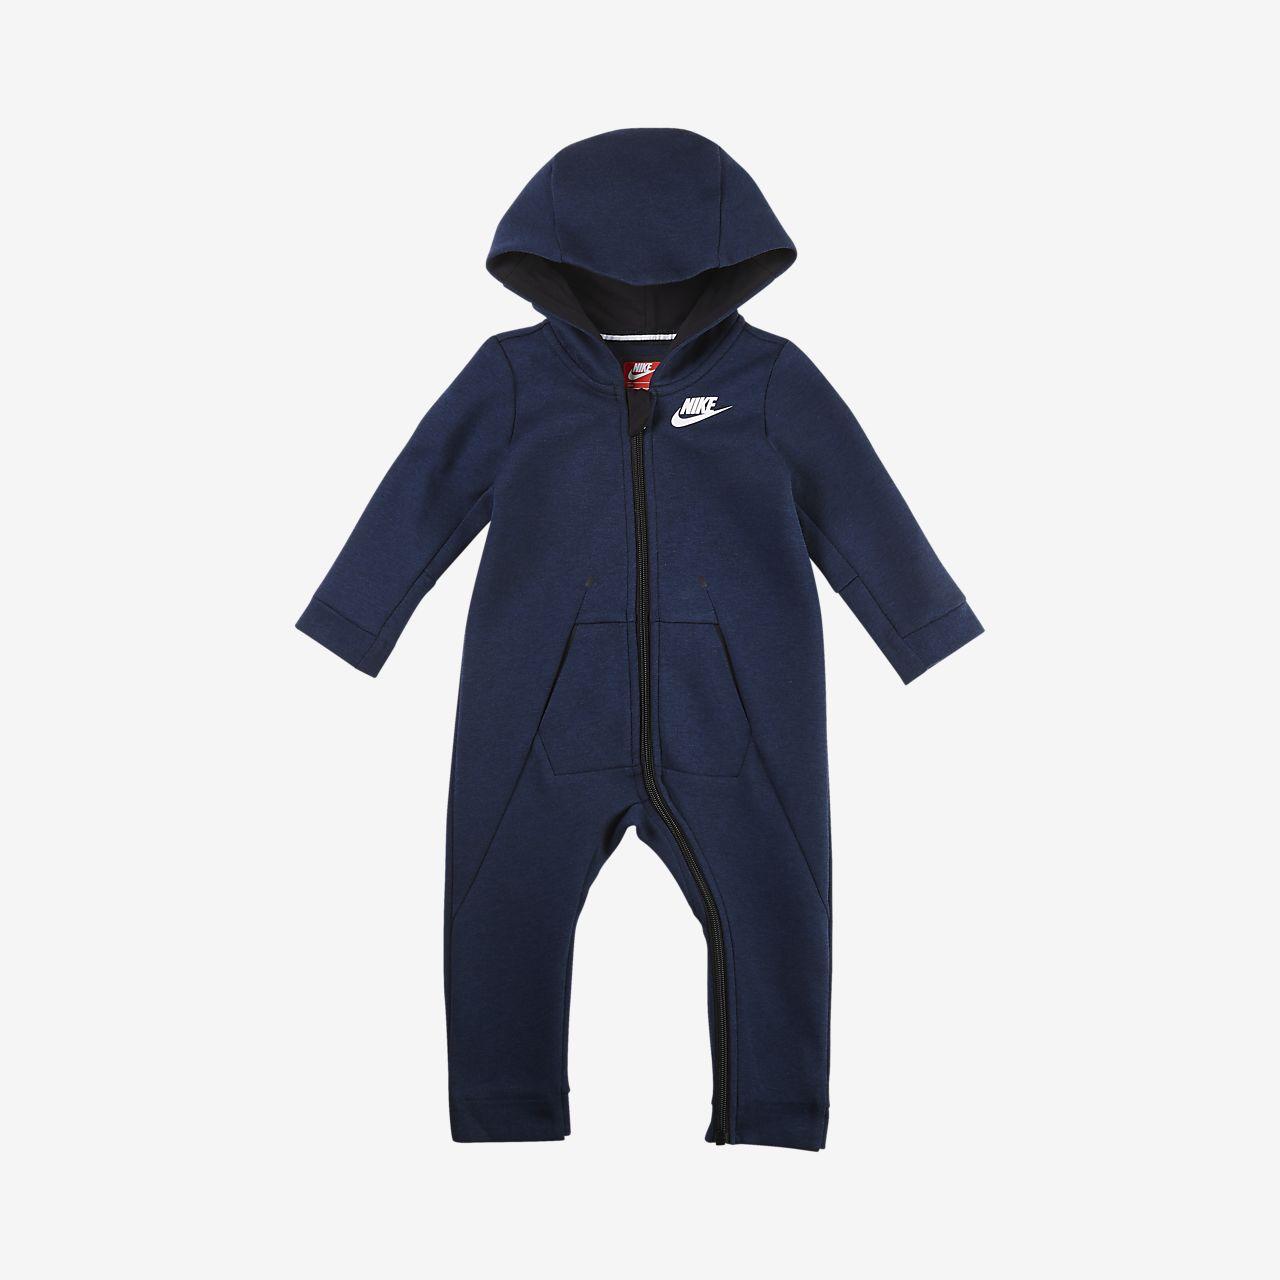 Nike Sportswear Tech Fleece Overall mit Kapuze für Babys (12–24 M)